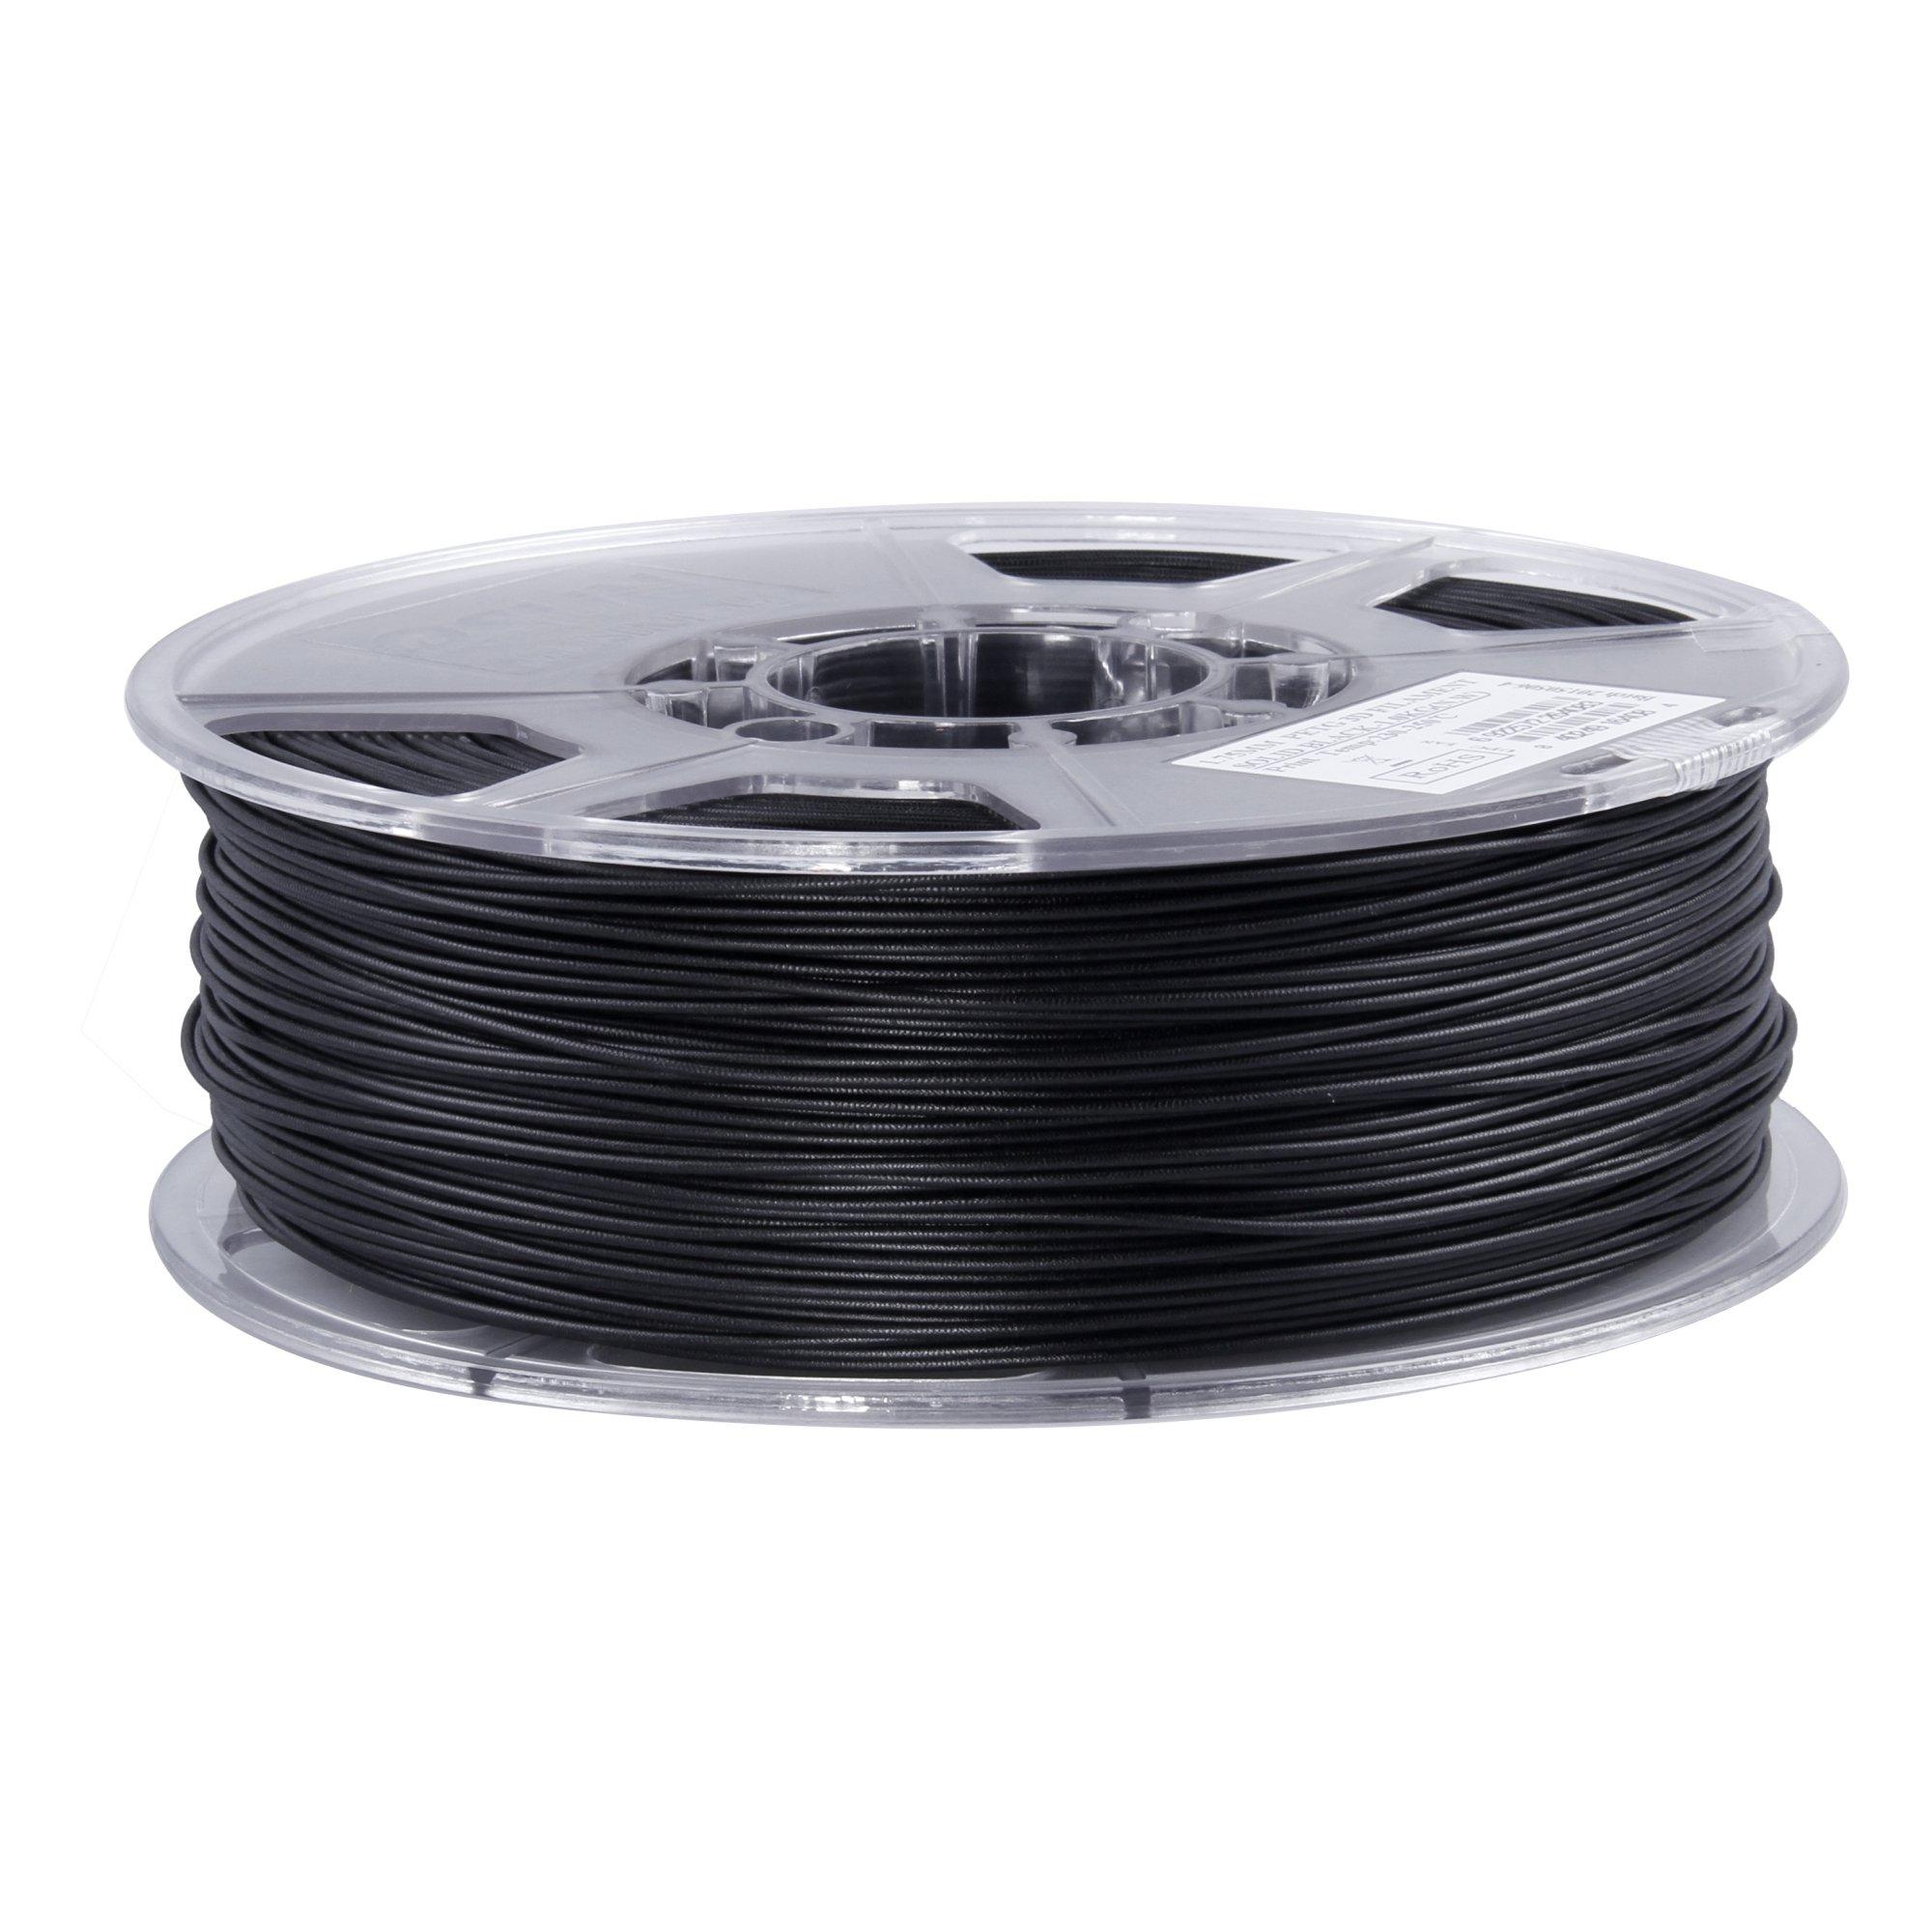 PETG Filament For 3D Printing